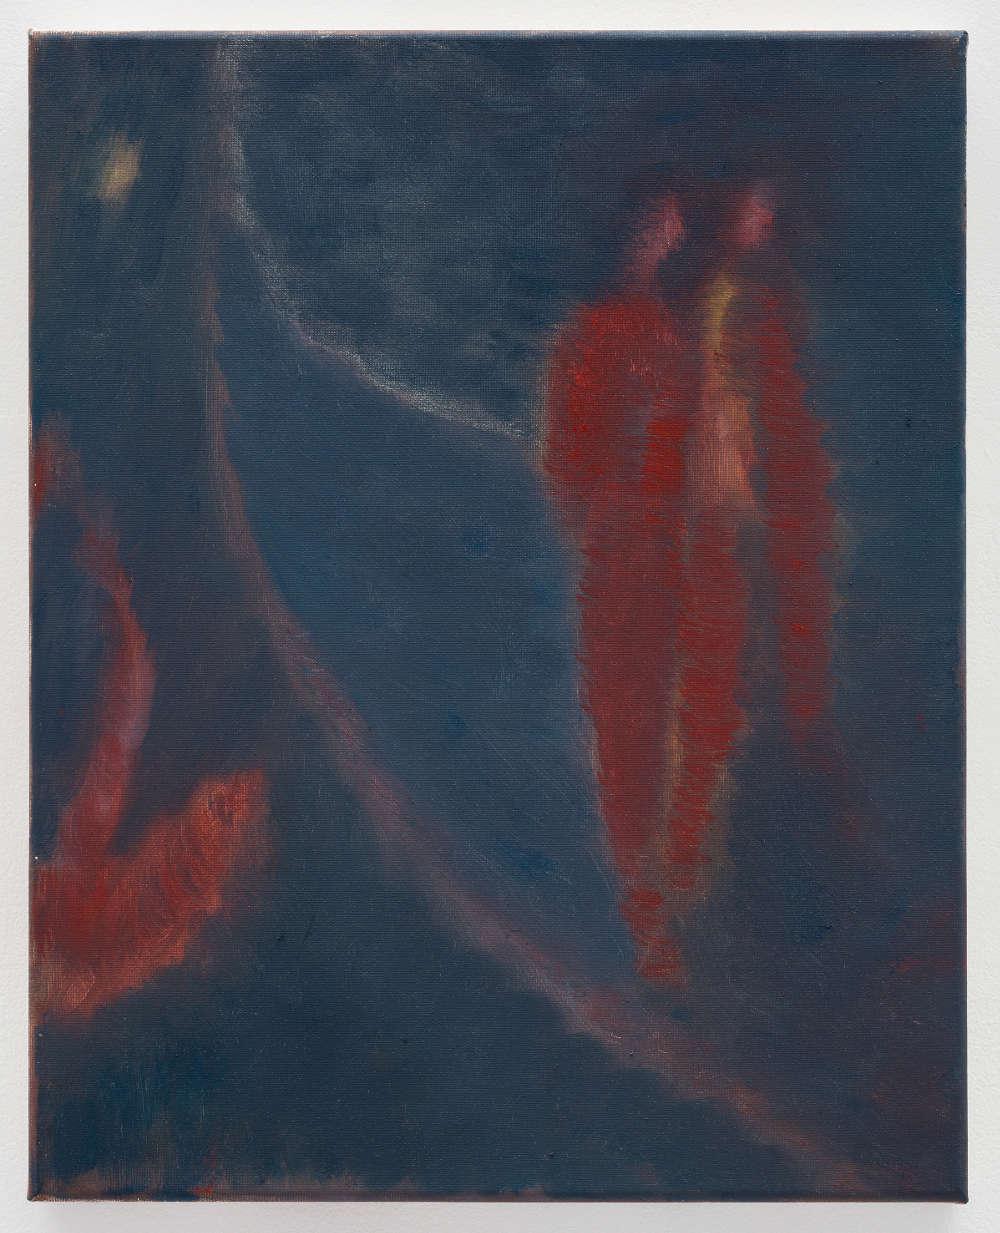 Behrang Karimi, Swan song, 2019. Oil on canvas 50 x 40 cm © Behrang Karimi, courtesy Maureen Paley, London